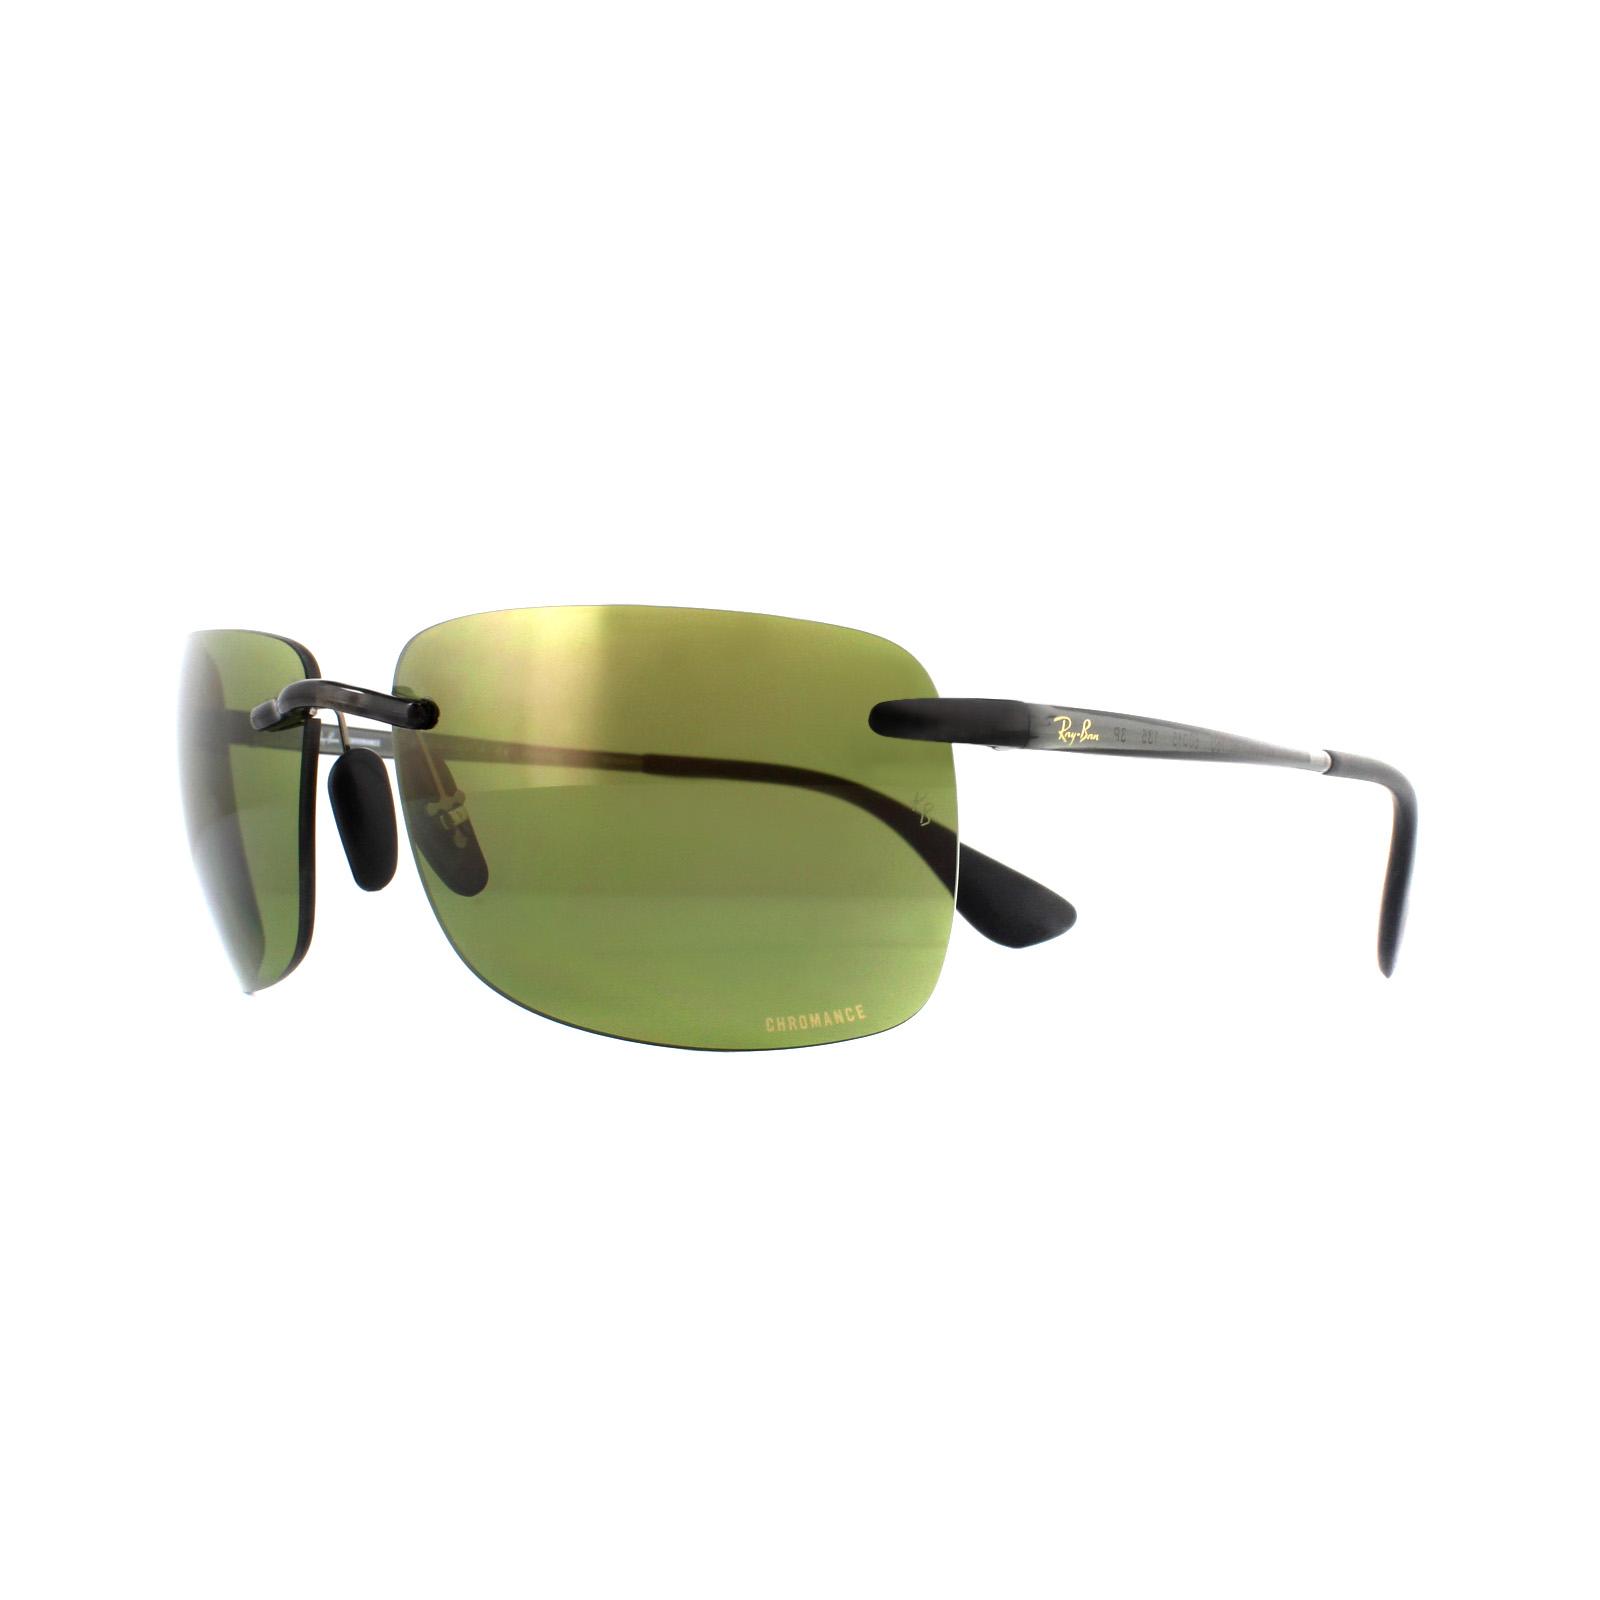 f348b66cb9 Sentinel Ray-Ban Sunglasses RB4255 621 6O Shiny Grey Green Mirror Polarized  Chromance